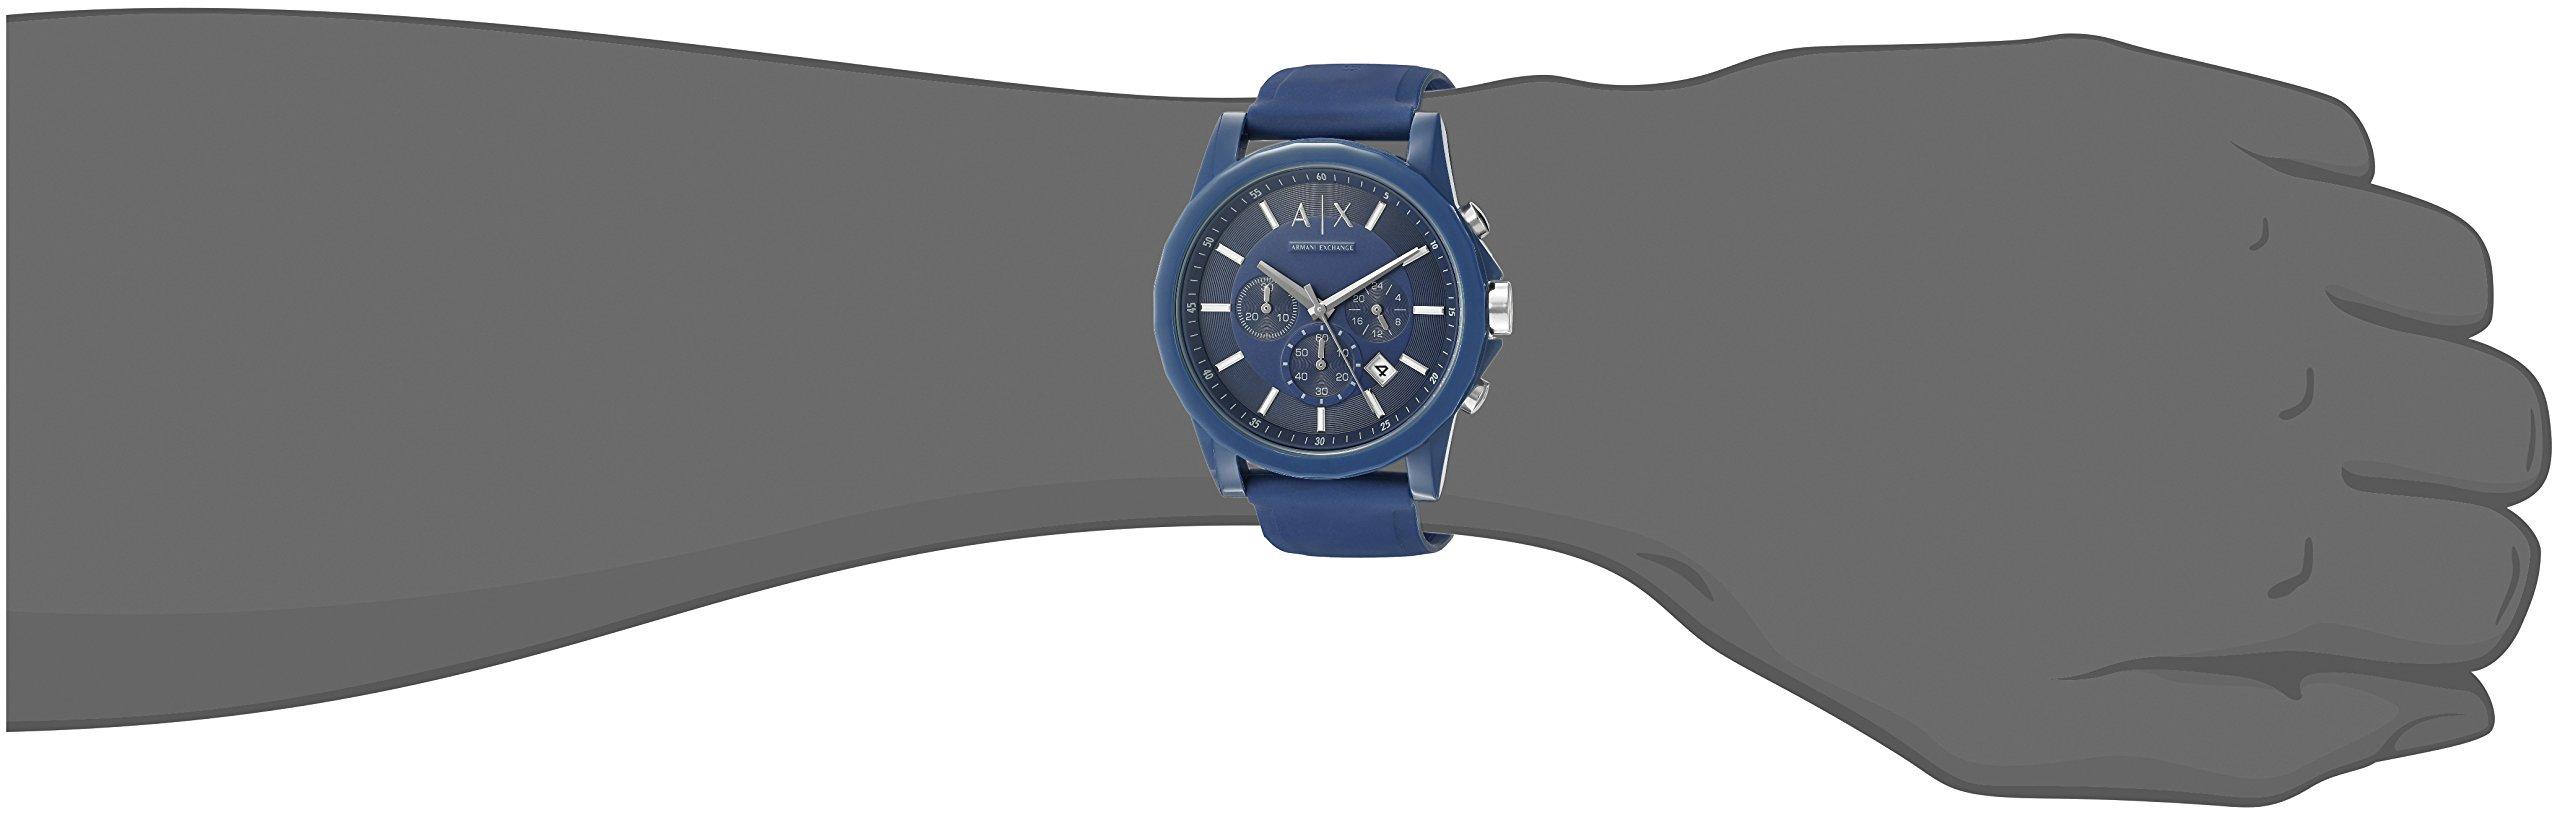 Armani Exchange Analog Blue Dial Unisex Watch – AX1327